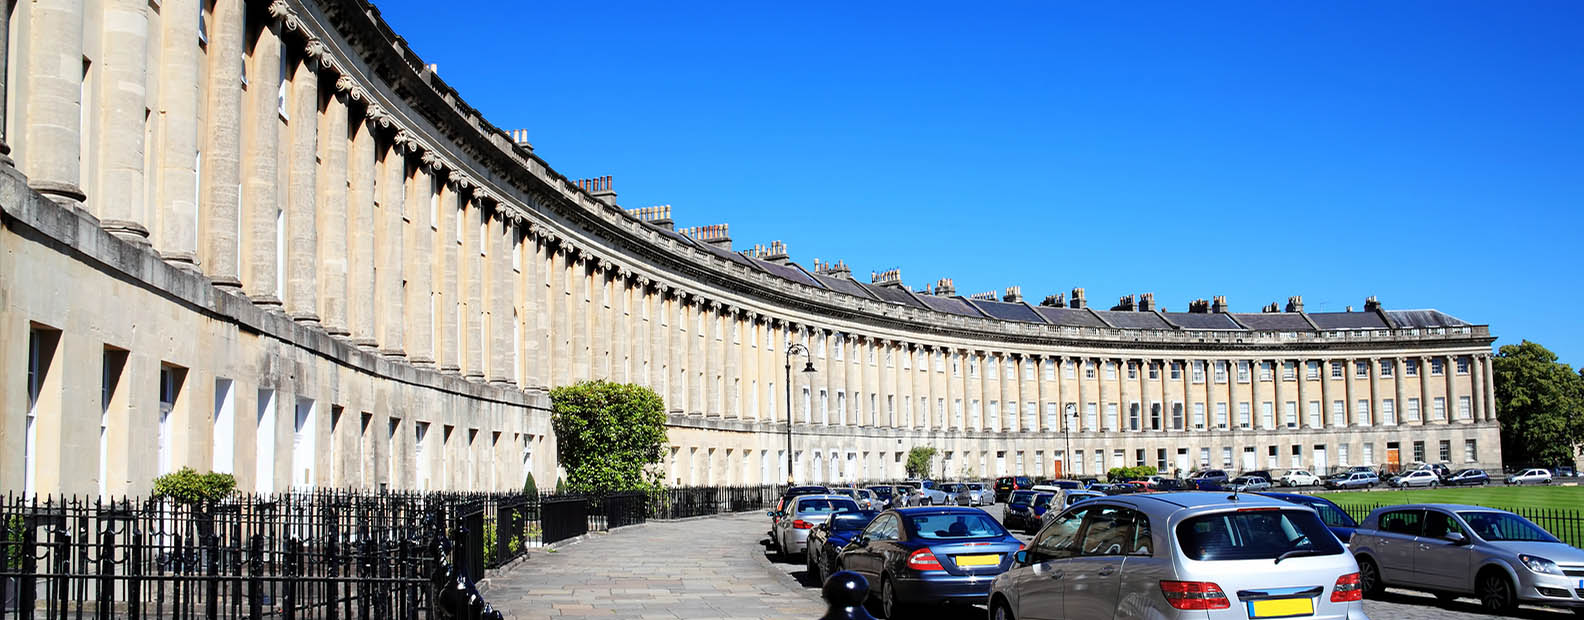 bigstock-Royal-Crescent-in-Bath-90379988-NEW